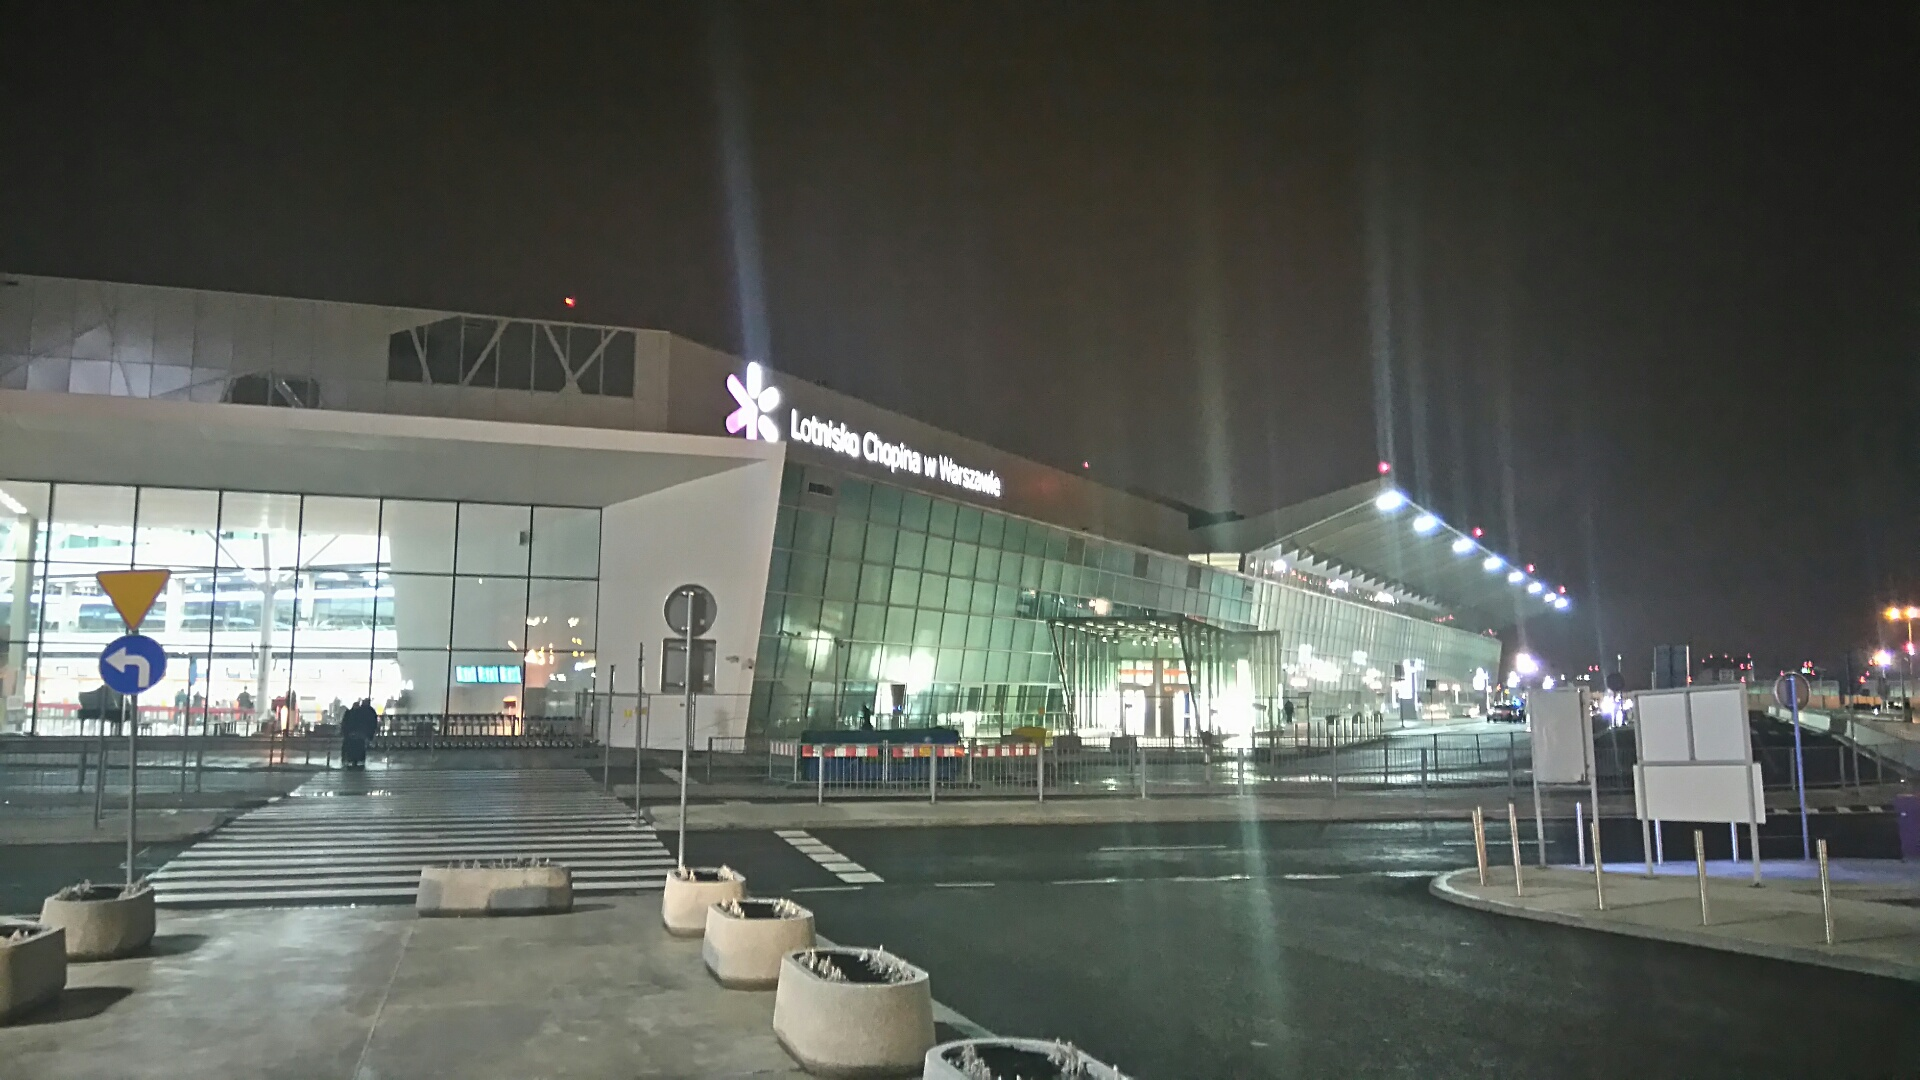 Lotnisko Chopina marzec 2016